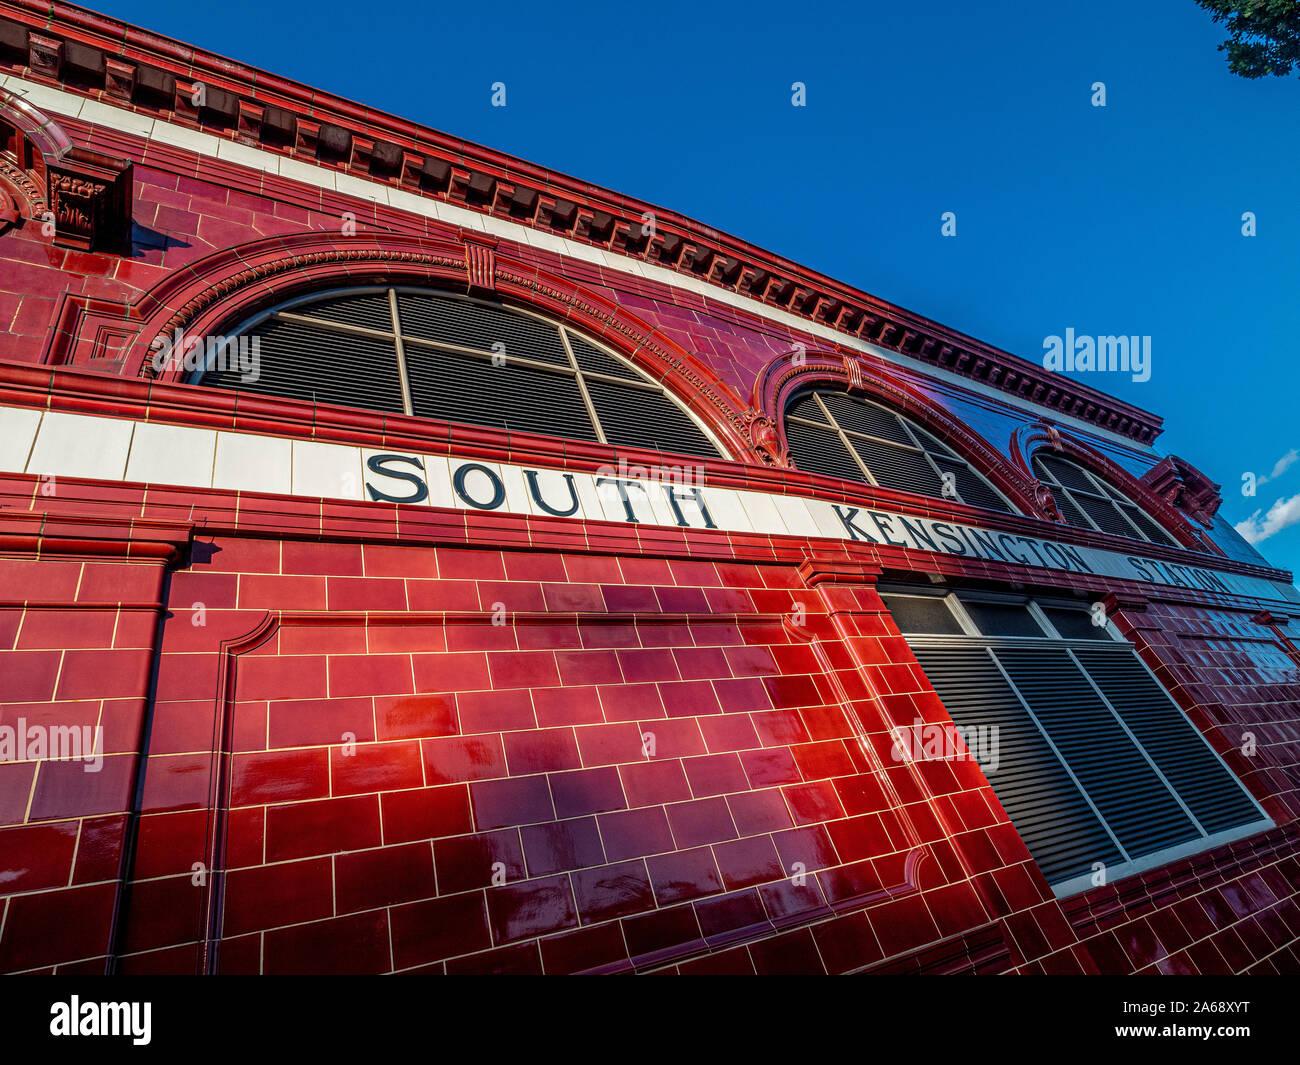 Rot gefliestem Äußere der U-Bahn-Station South Kensington, London, Großbritannien. Stockfoto